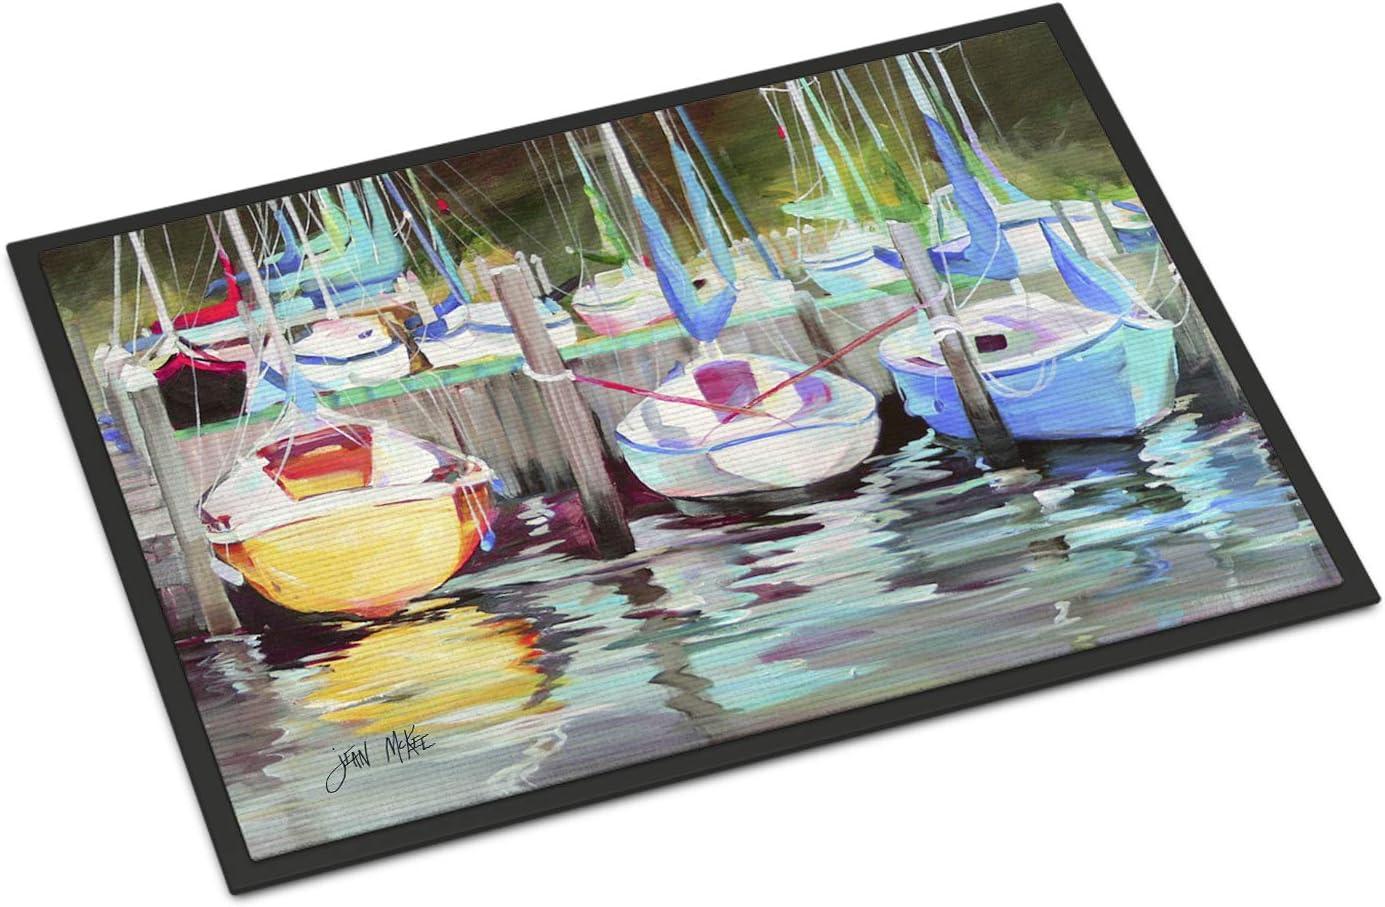 Carolines Treasures Sailboats at The Fairhope Yacht Club Floor Mat 19 x 27 Multicolor